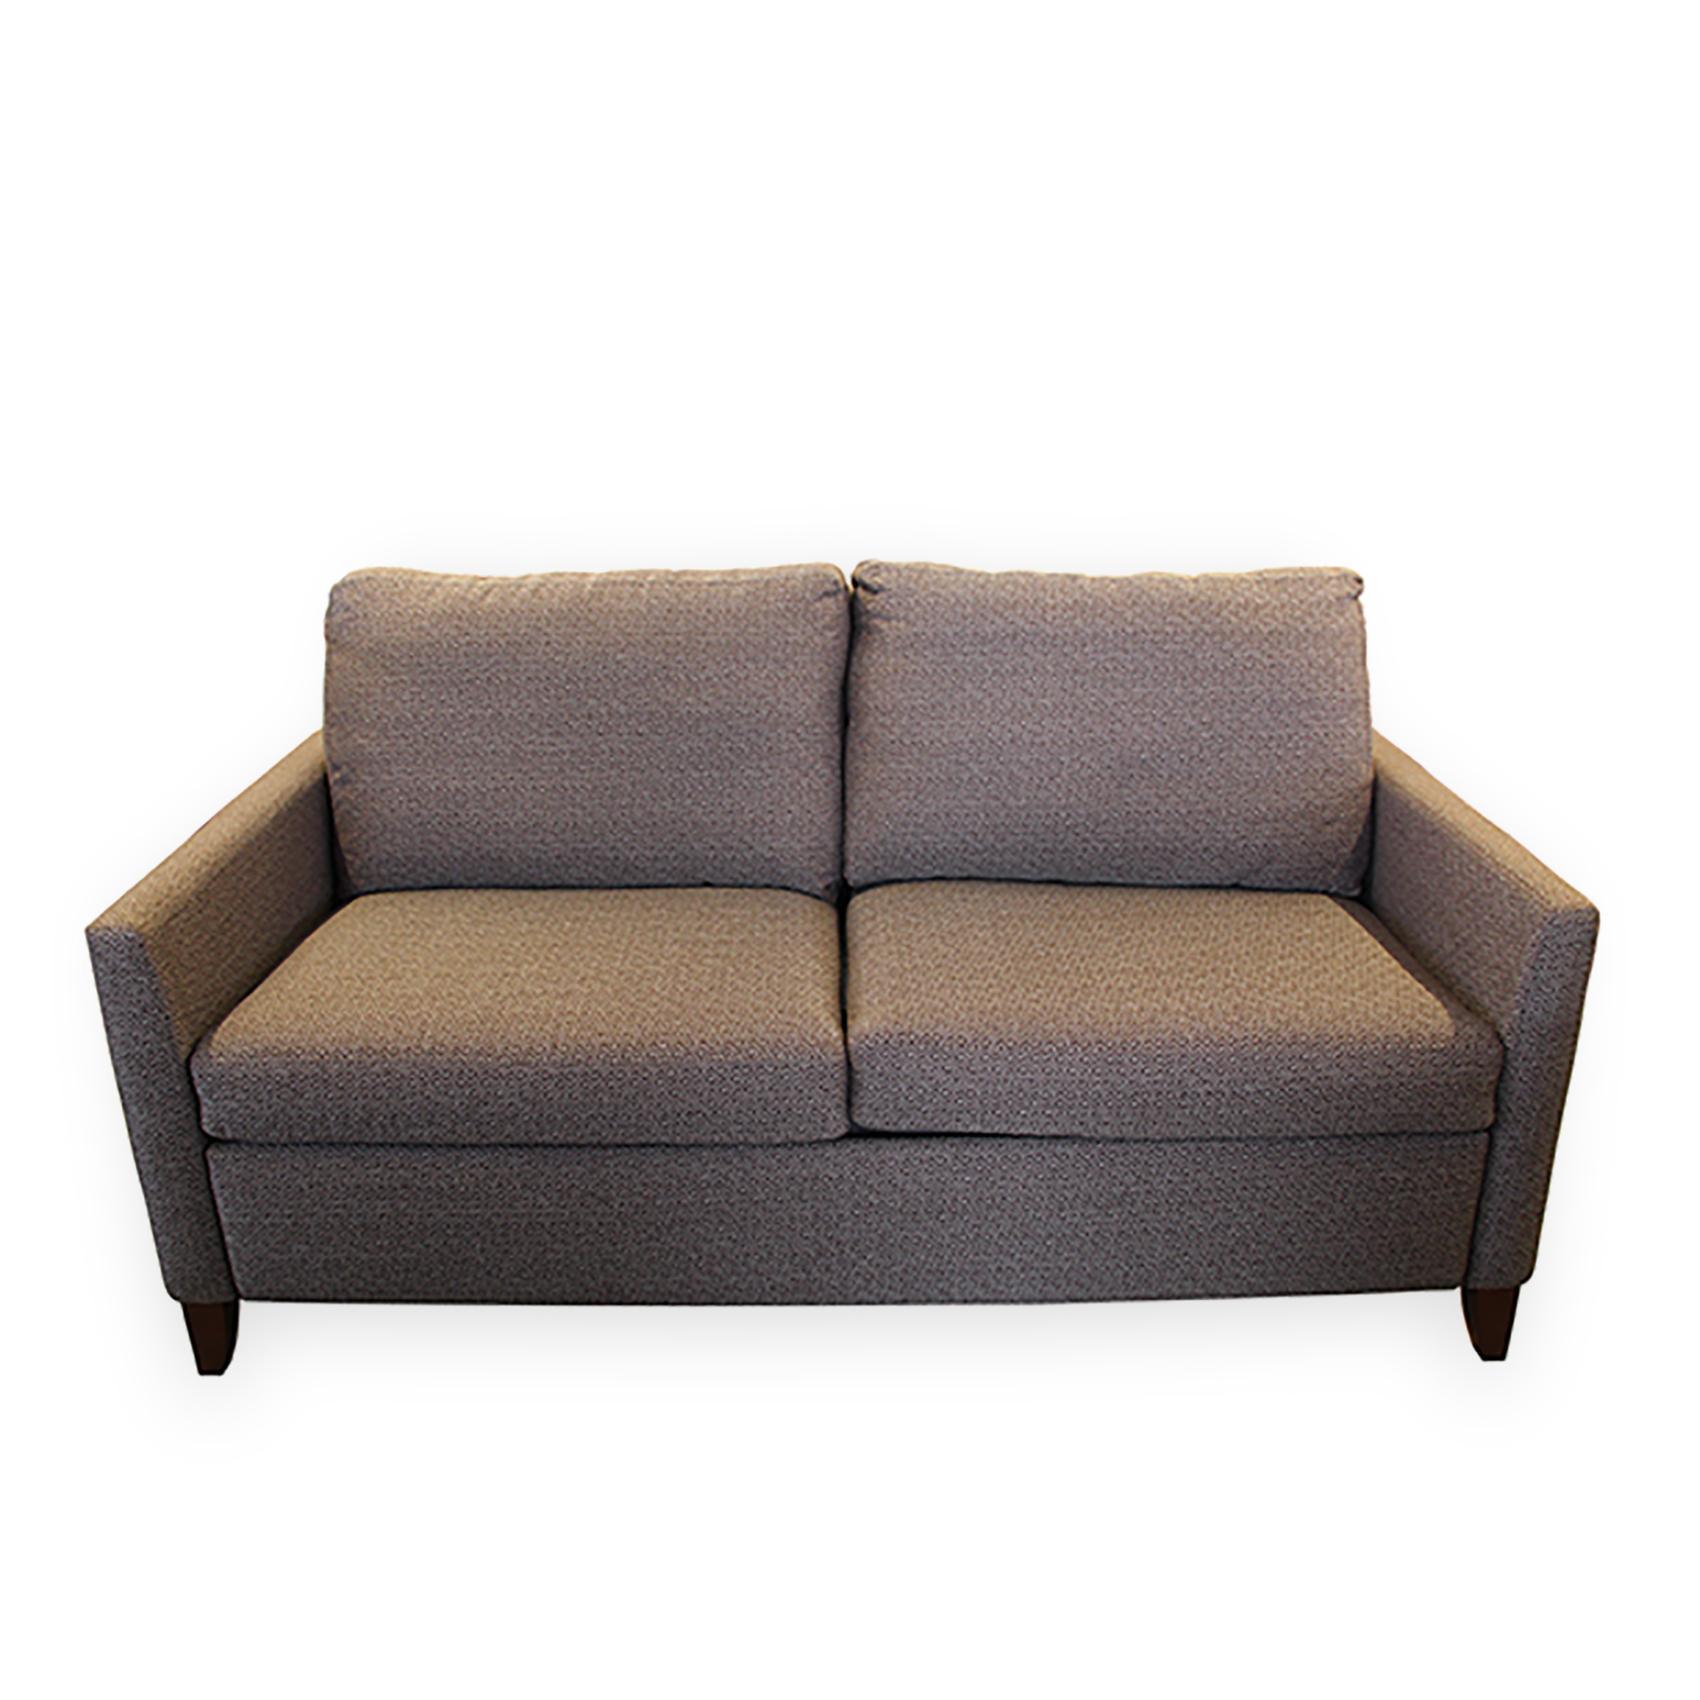 American Leather Harris Queen Size Sleeper Sofa